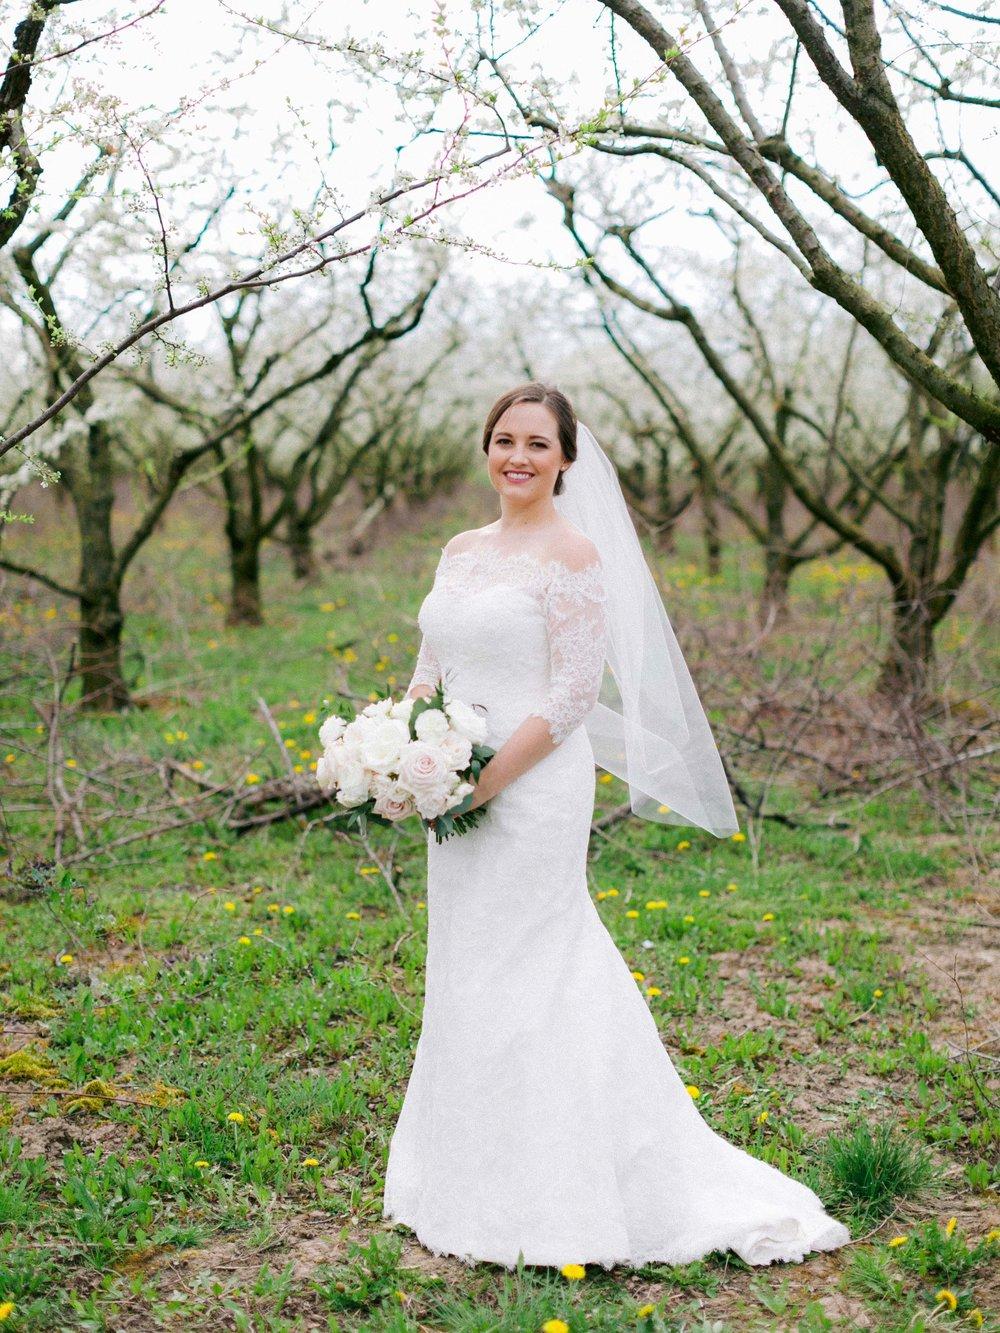 Niagara_on_the_lake_spring_wedding_kurtz_orpia_toronto_Vineyard_wedding_fine_art (64 of 92).jpg